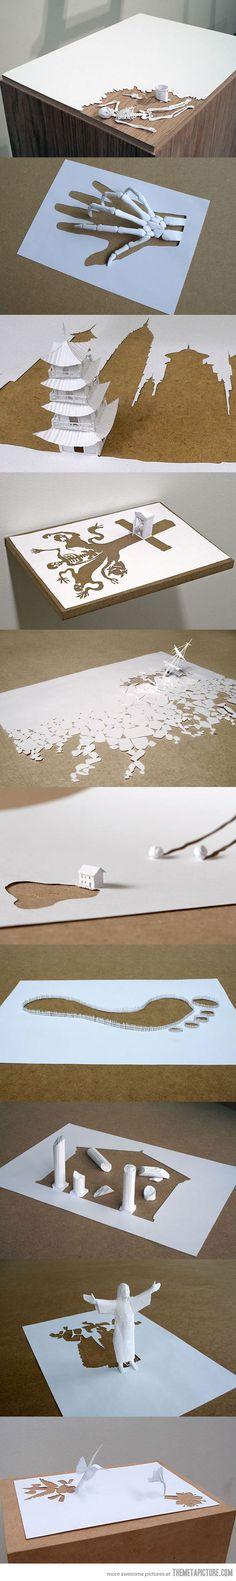 Amazing paper art by Peter Callesen…  __________ Reptiliam Visual te invita a conocer nuestro trabajo en: www.reptiliamvisual.com.co